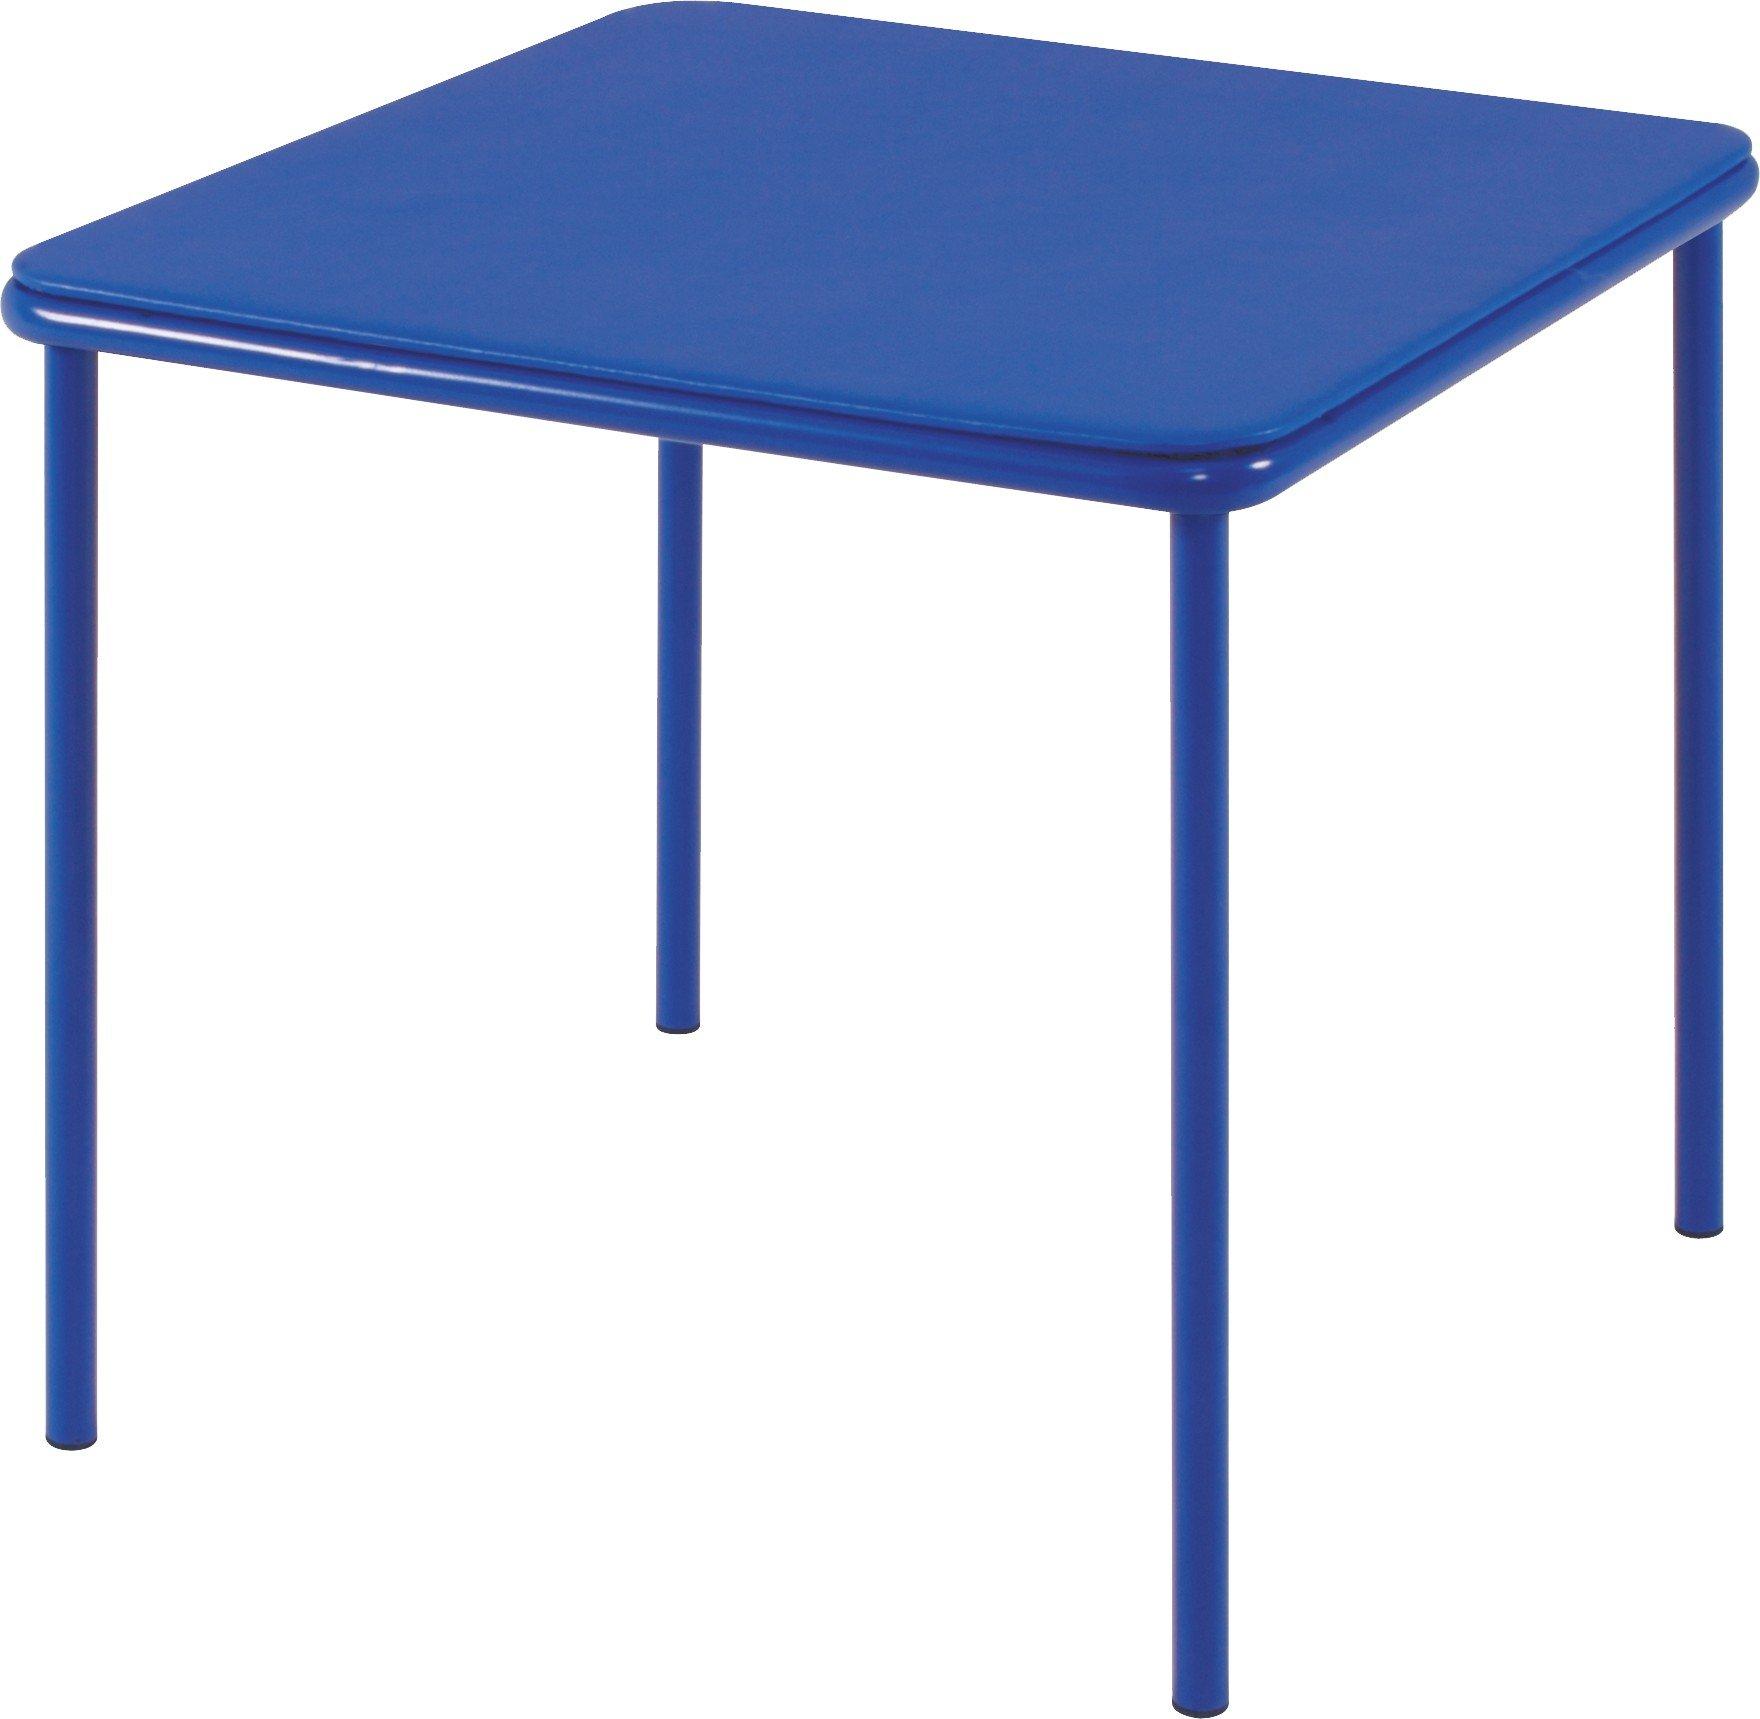 Cosco Kid's Vinyl Top Table Blue